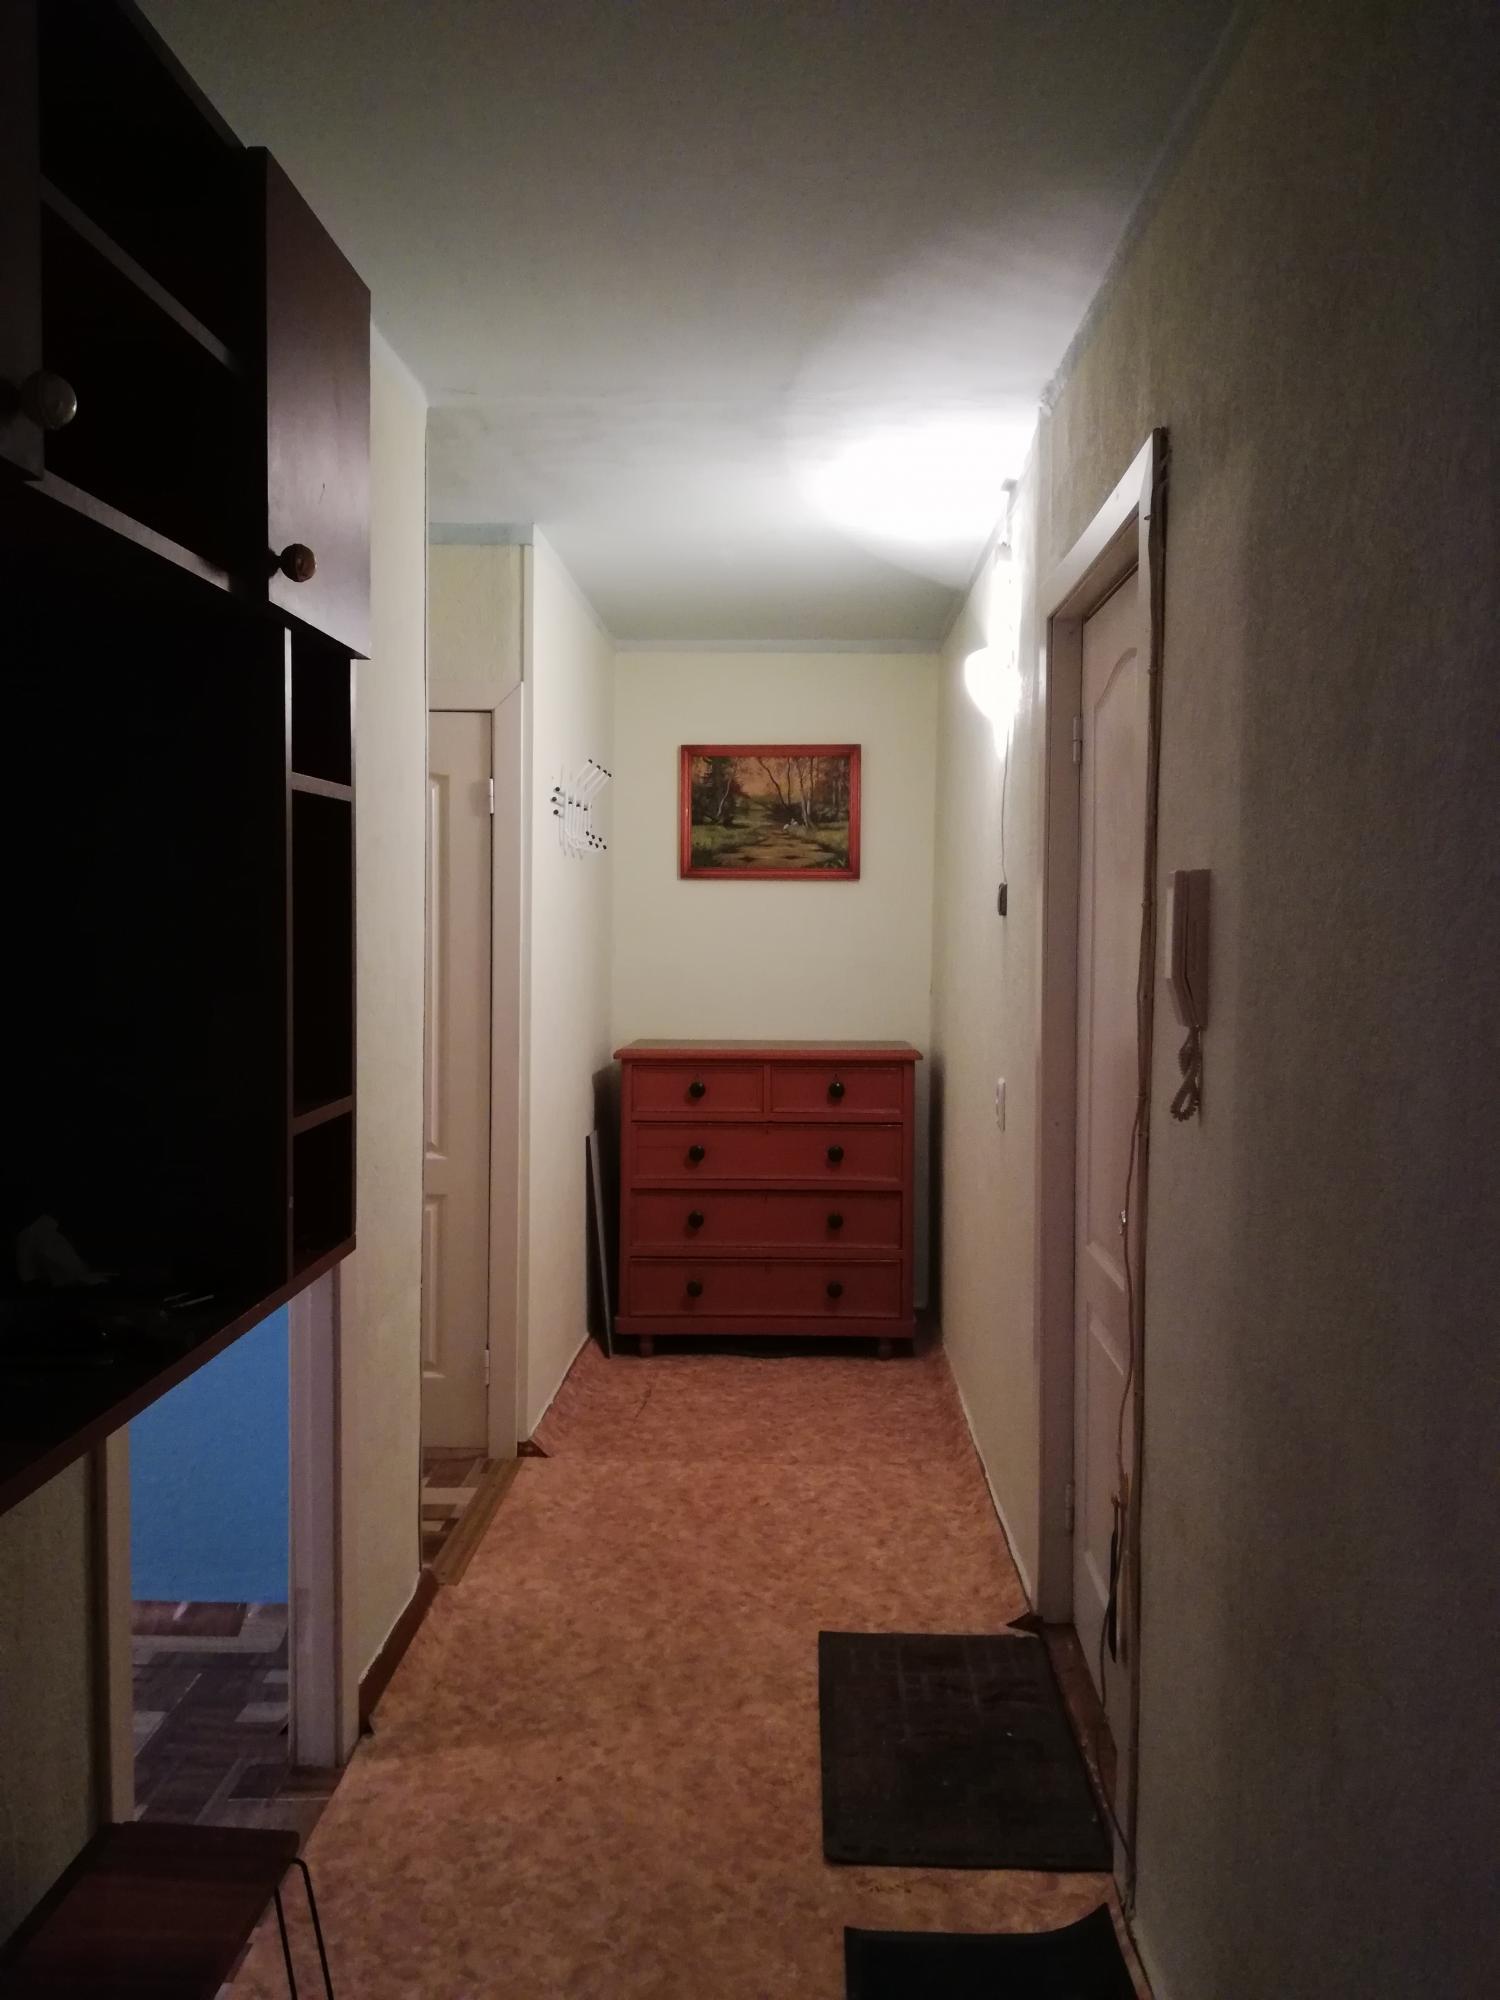 2к квартира улица 60 лет Октября, 56А | 15000 | аренда в Красноярске фото 8